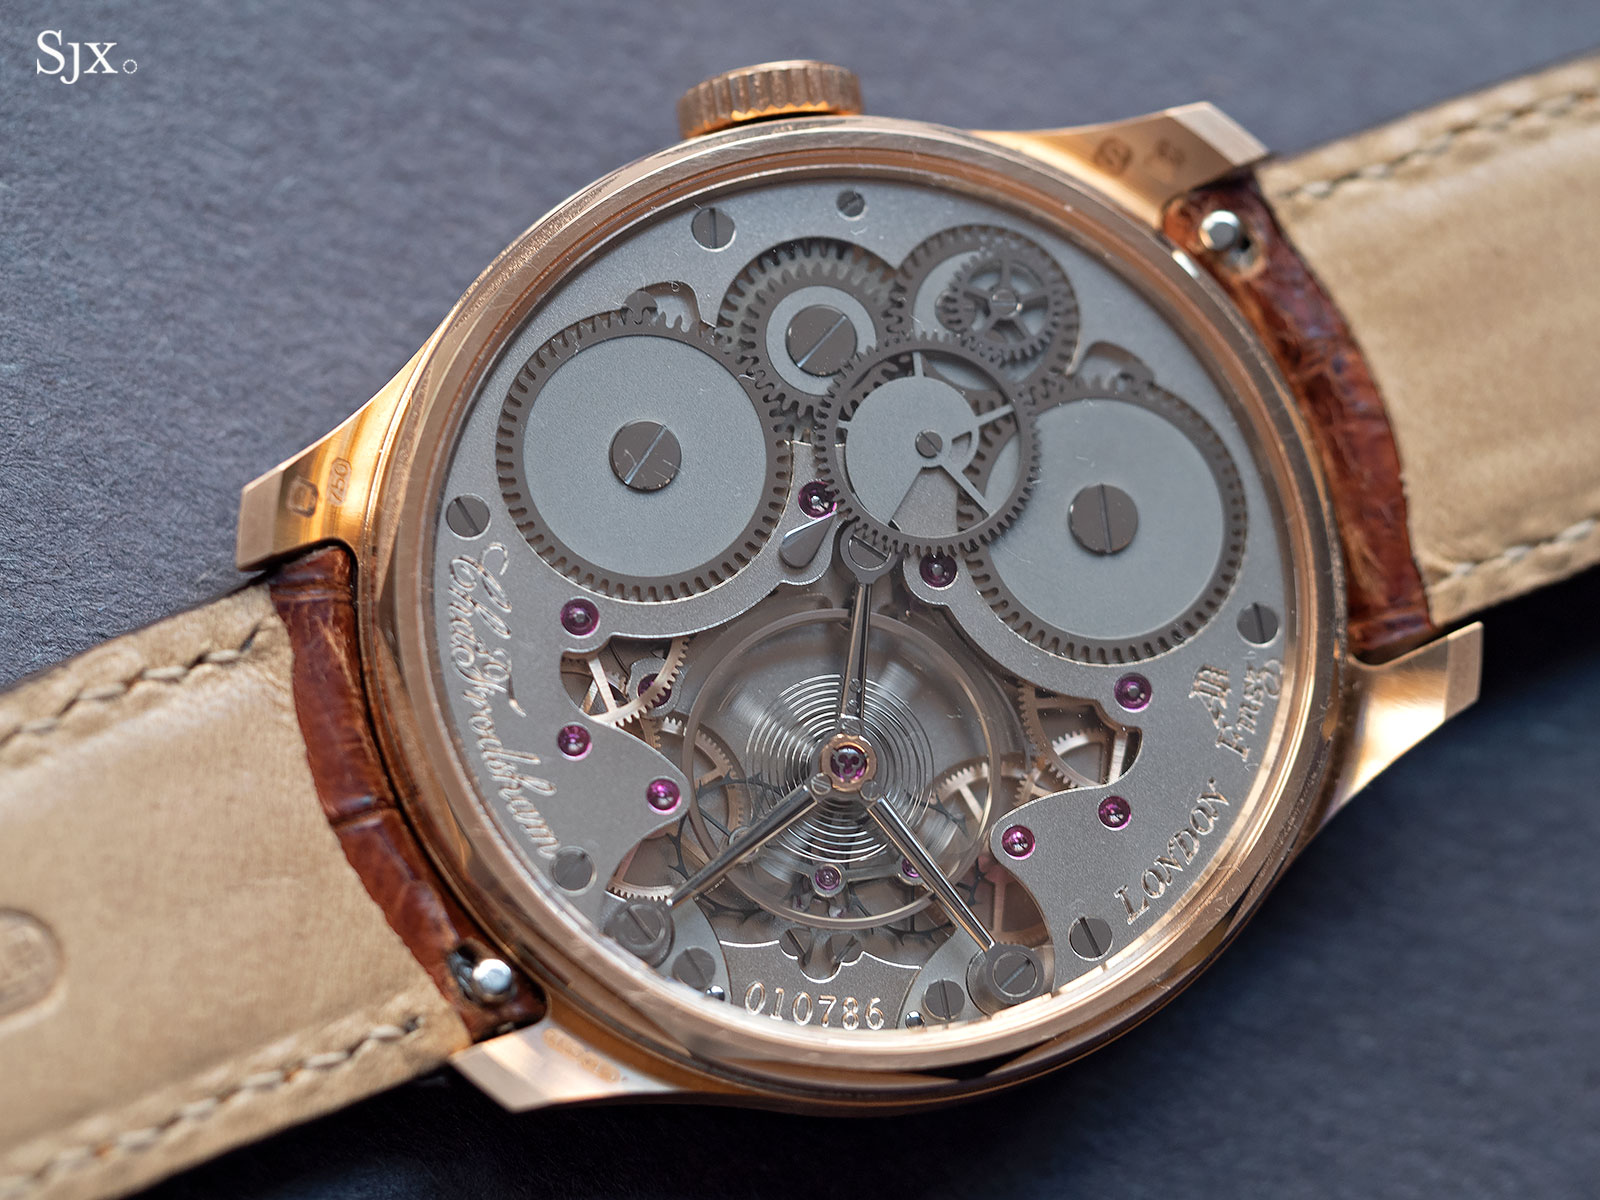 Frodsham Double Impulse chronometer rose gold 7